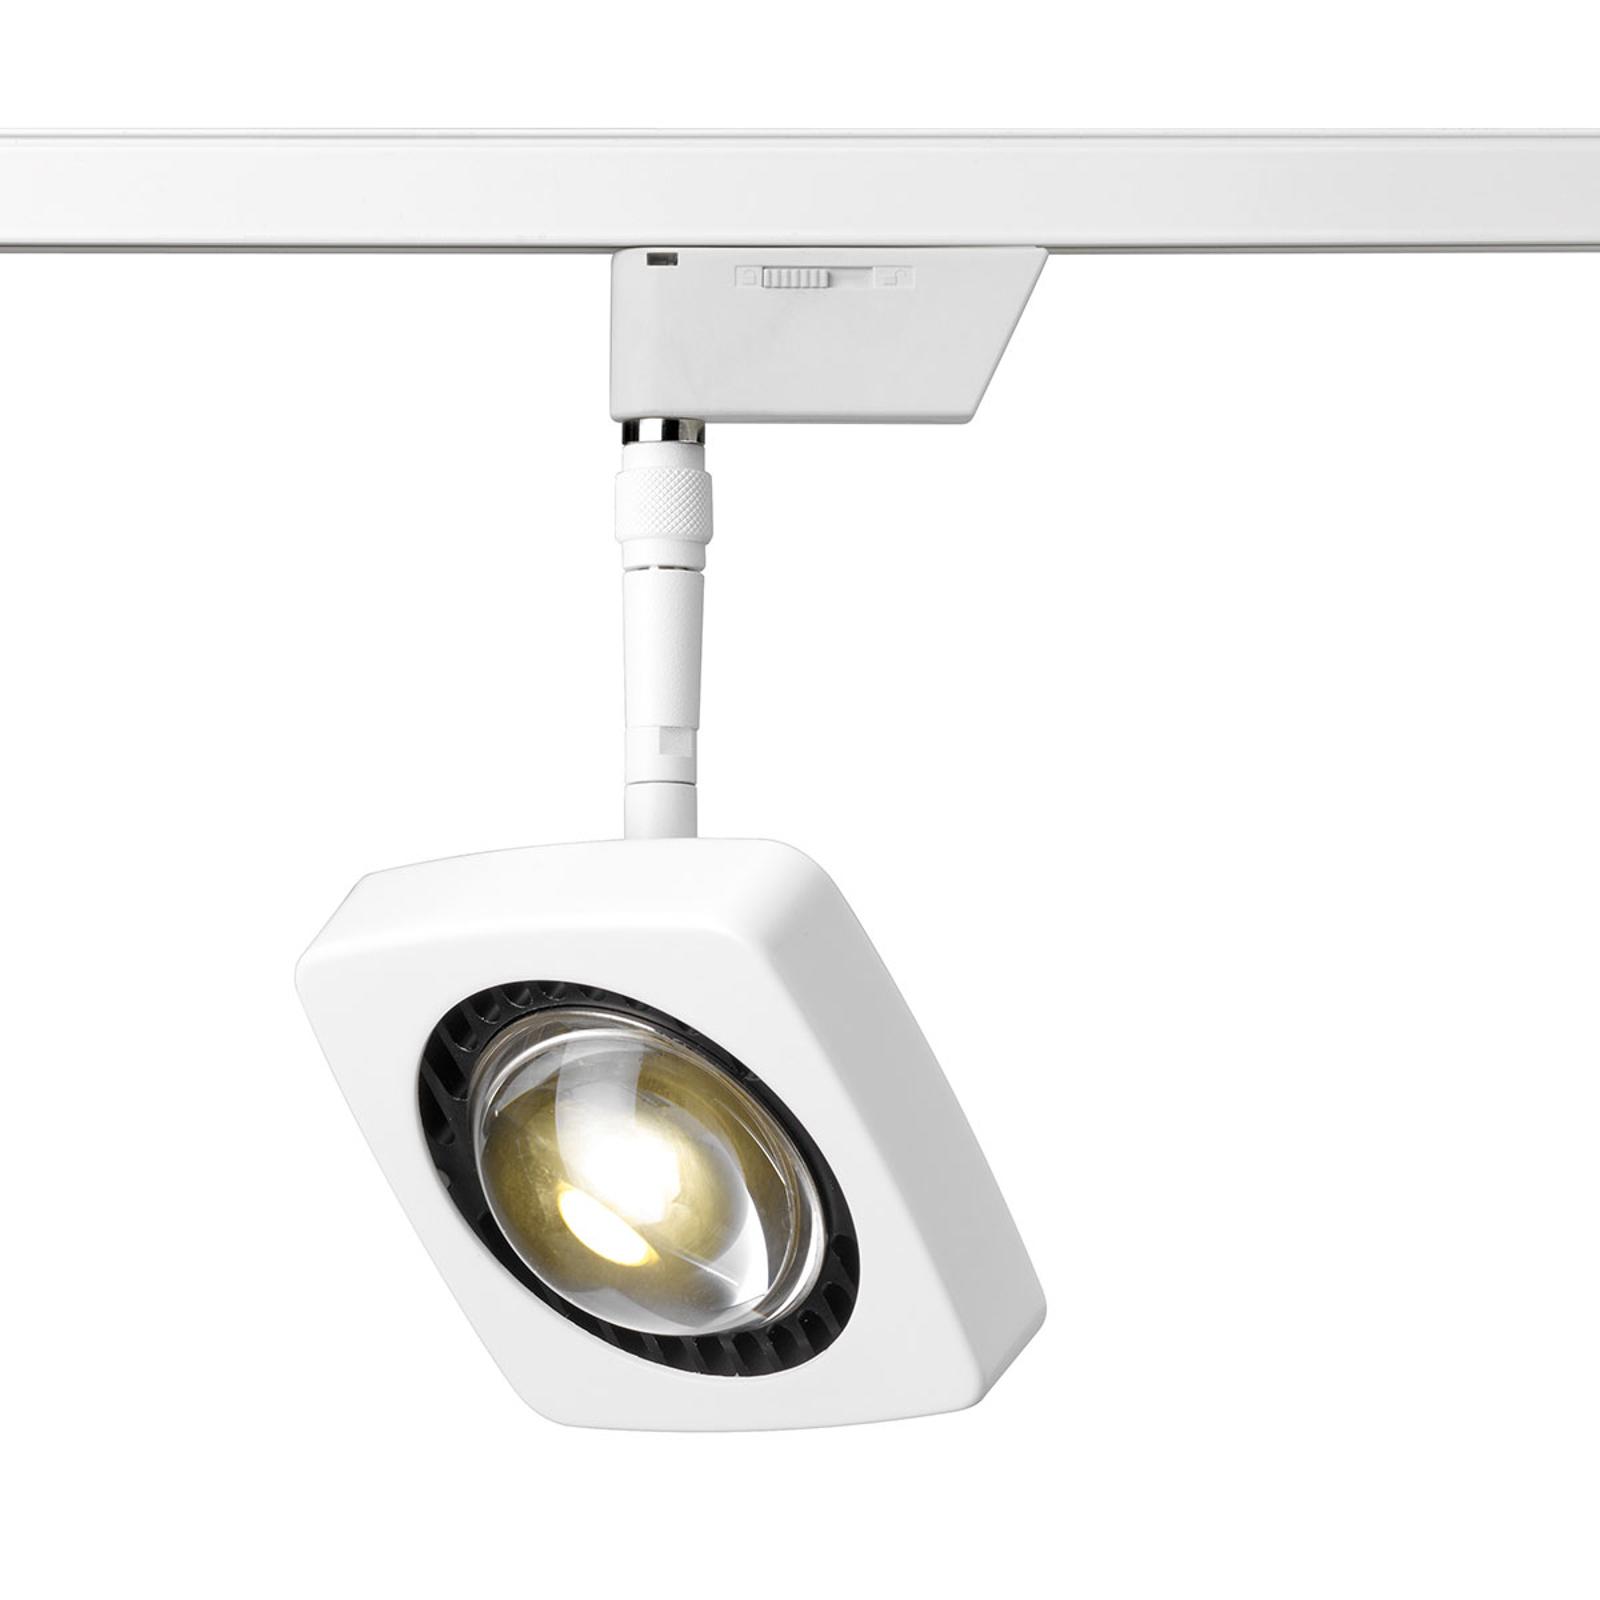 Oligo Kelveen LED-skinnespot varmhvit 90° hvit